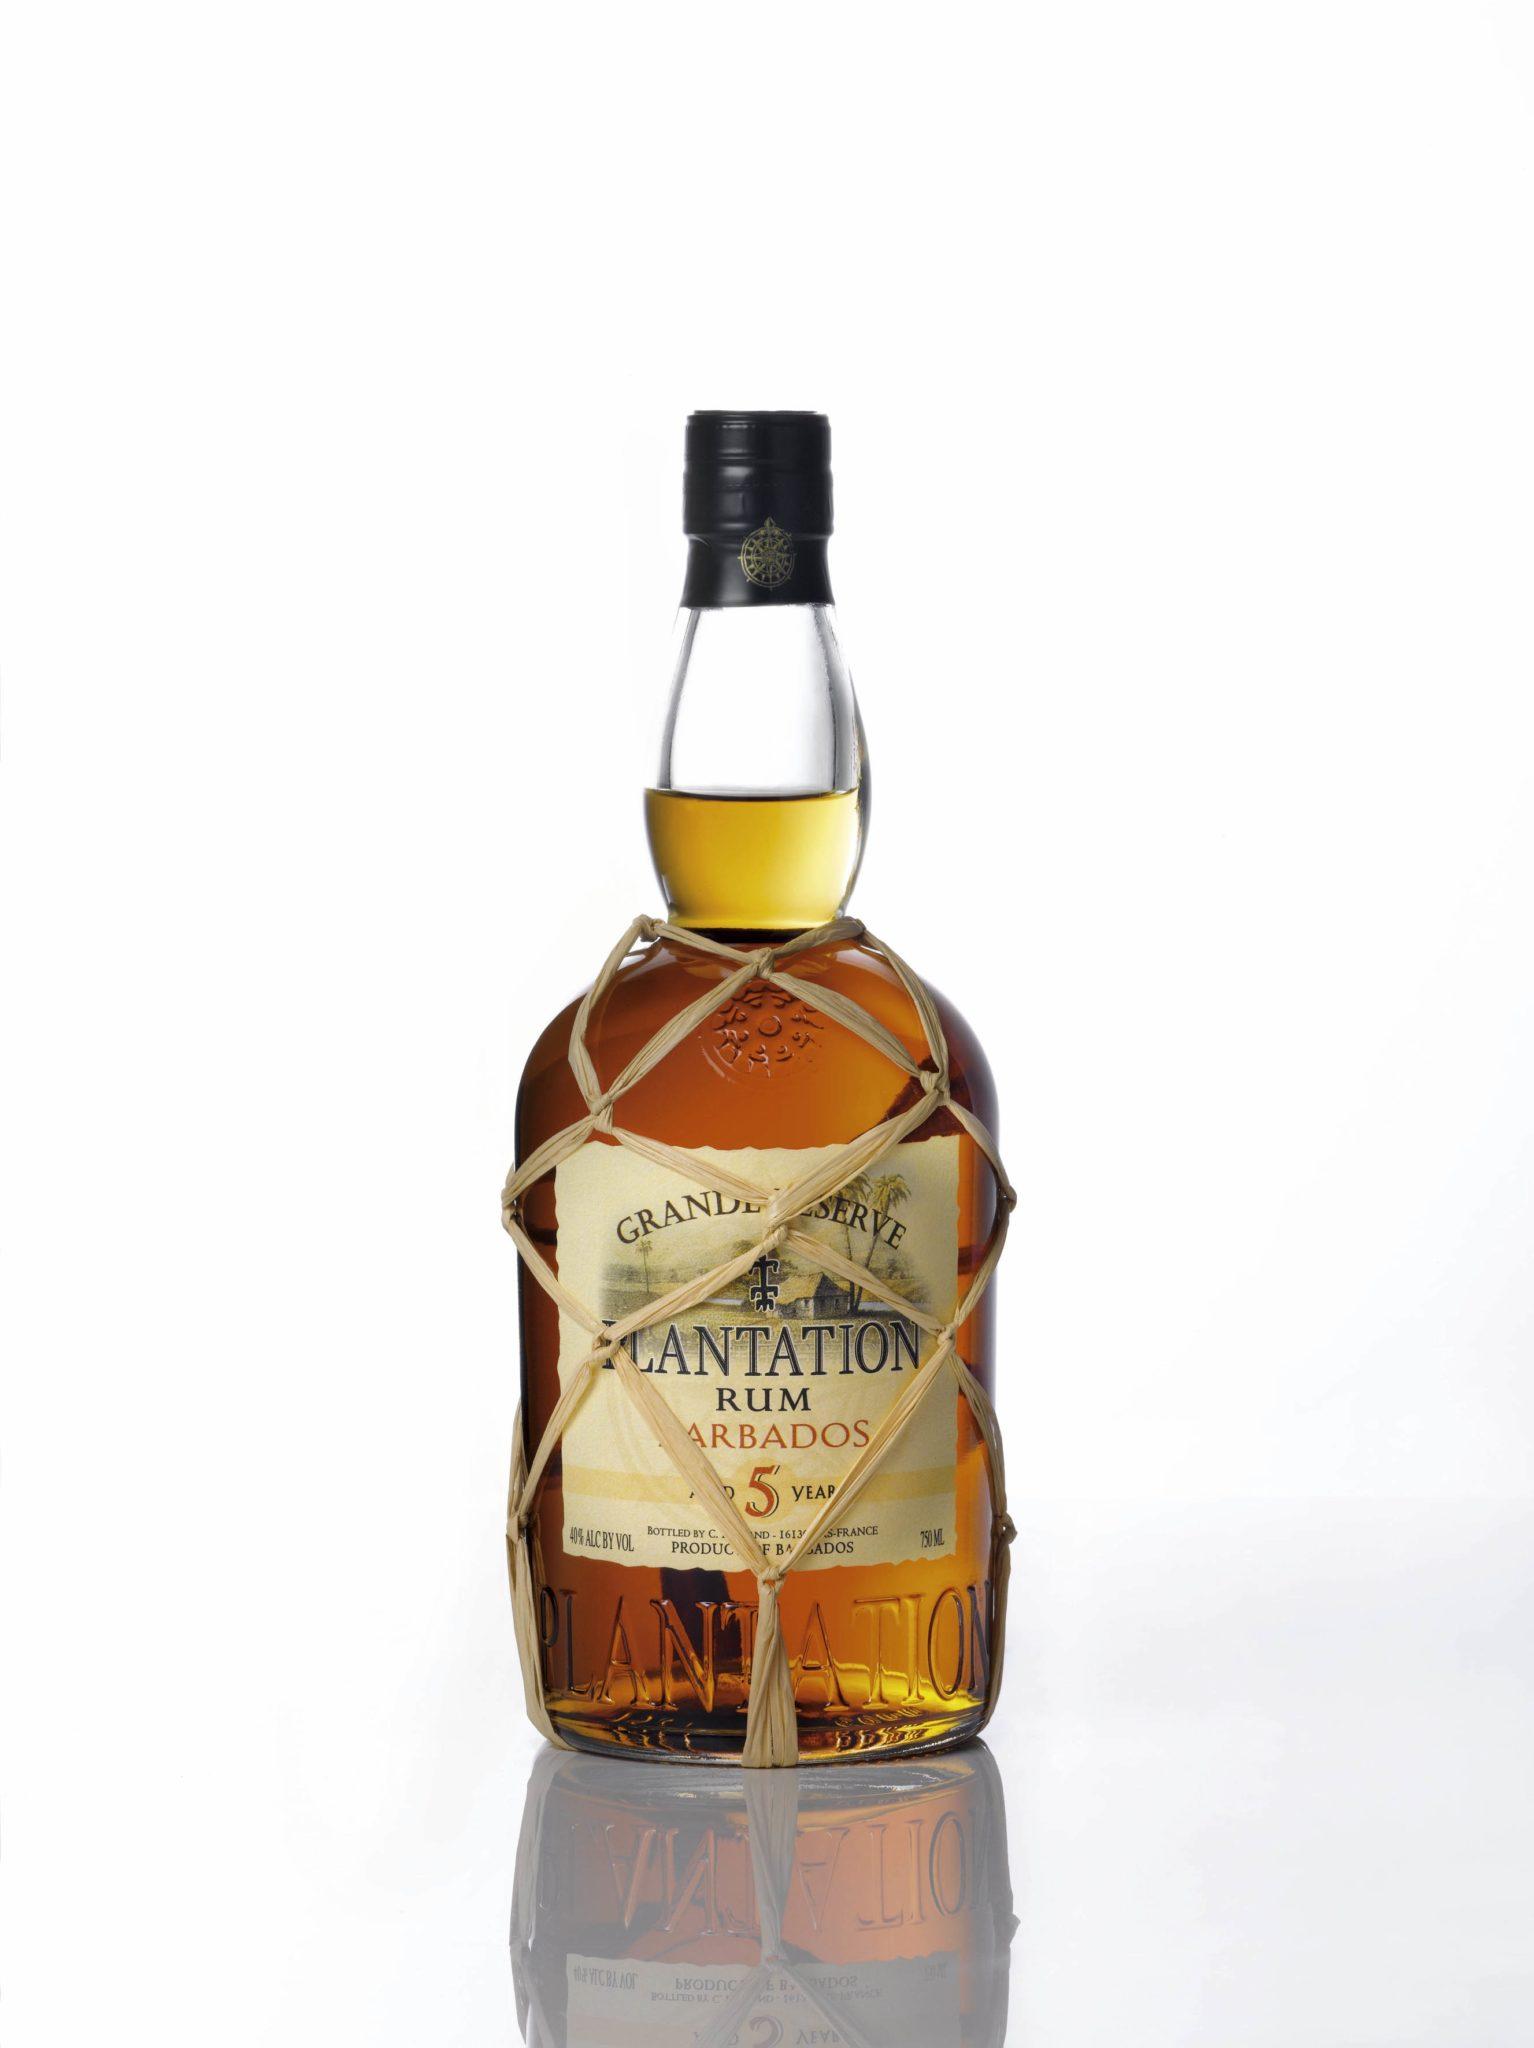 Plantation Grande Reserve Rum Barbados 5 years | Spirits ...